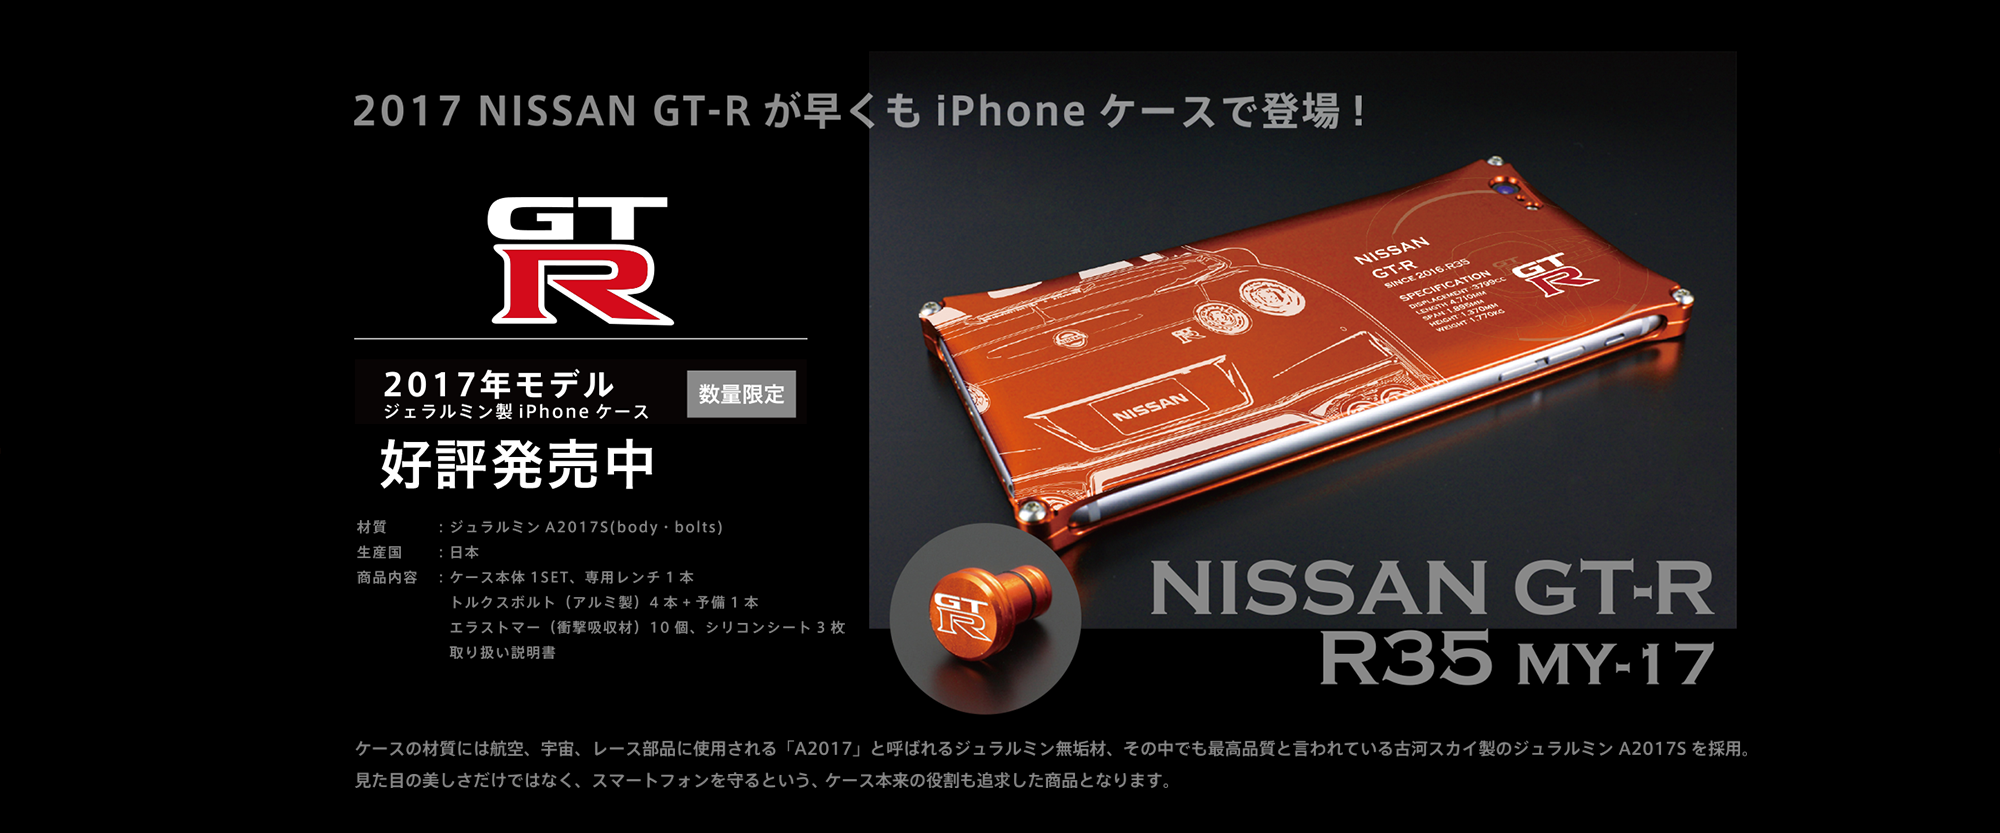 NISSAN GT-R R35 MY-17 iPhoneケース